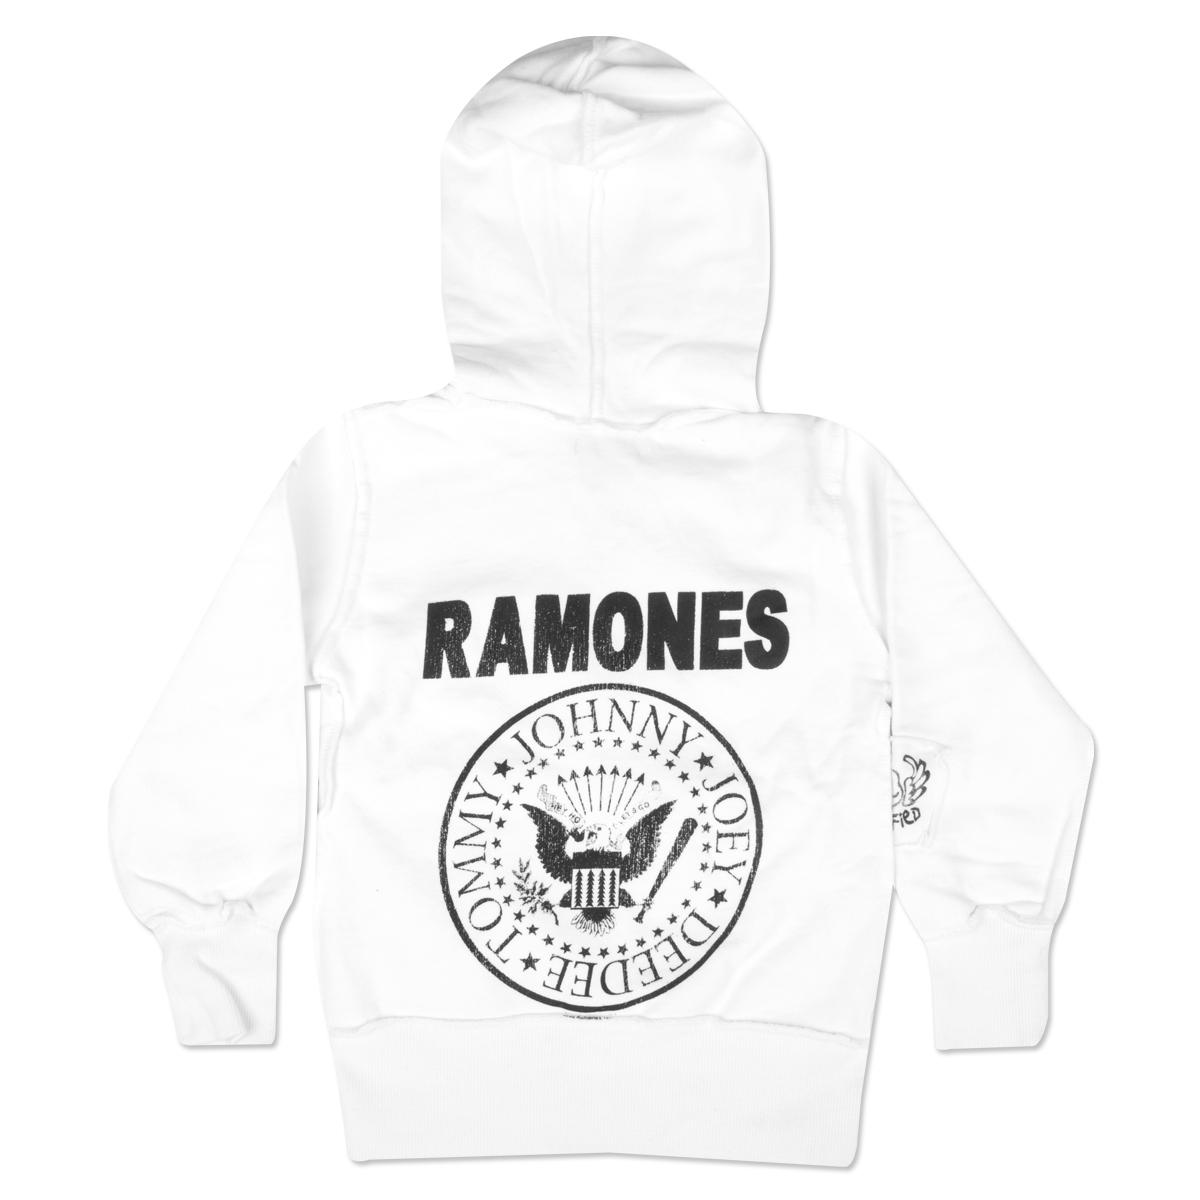 Ramones Kids Hoodie - White